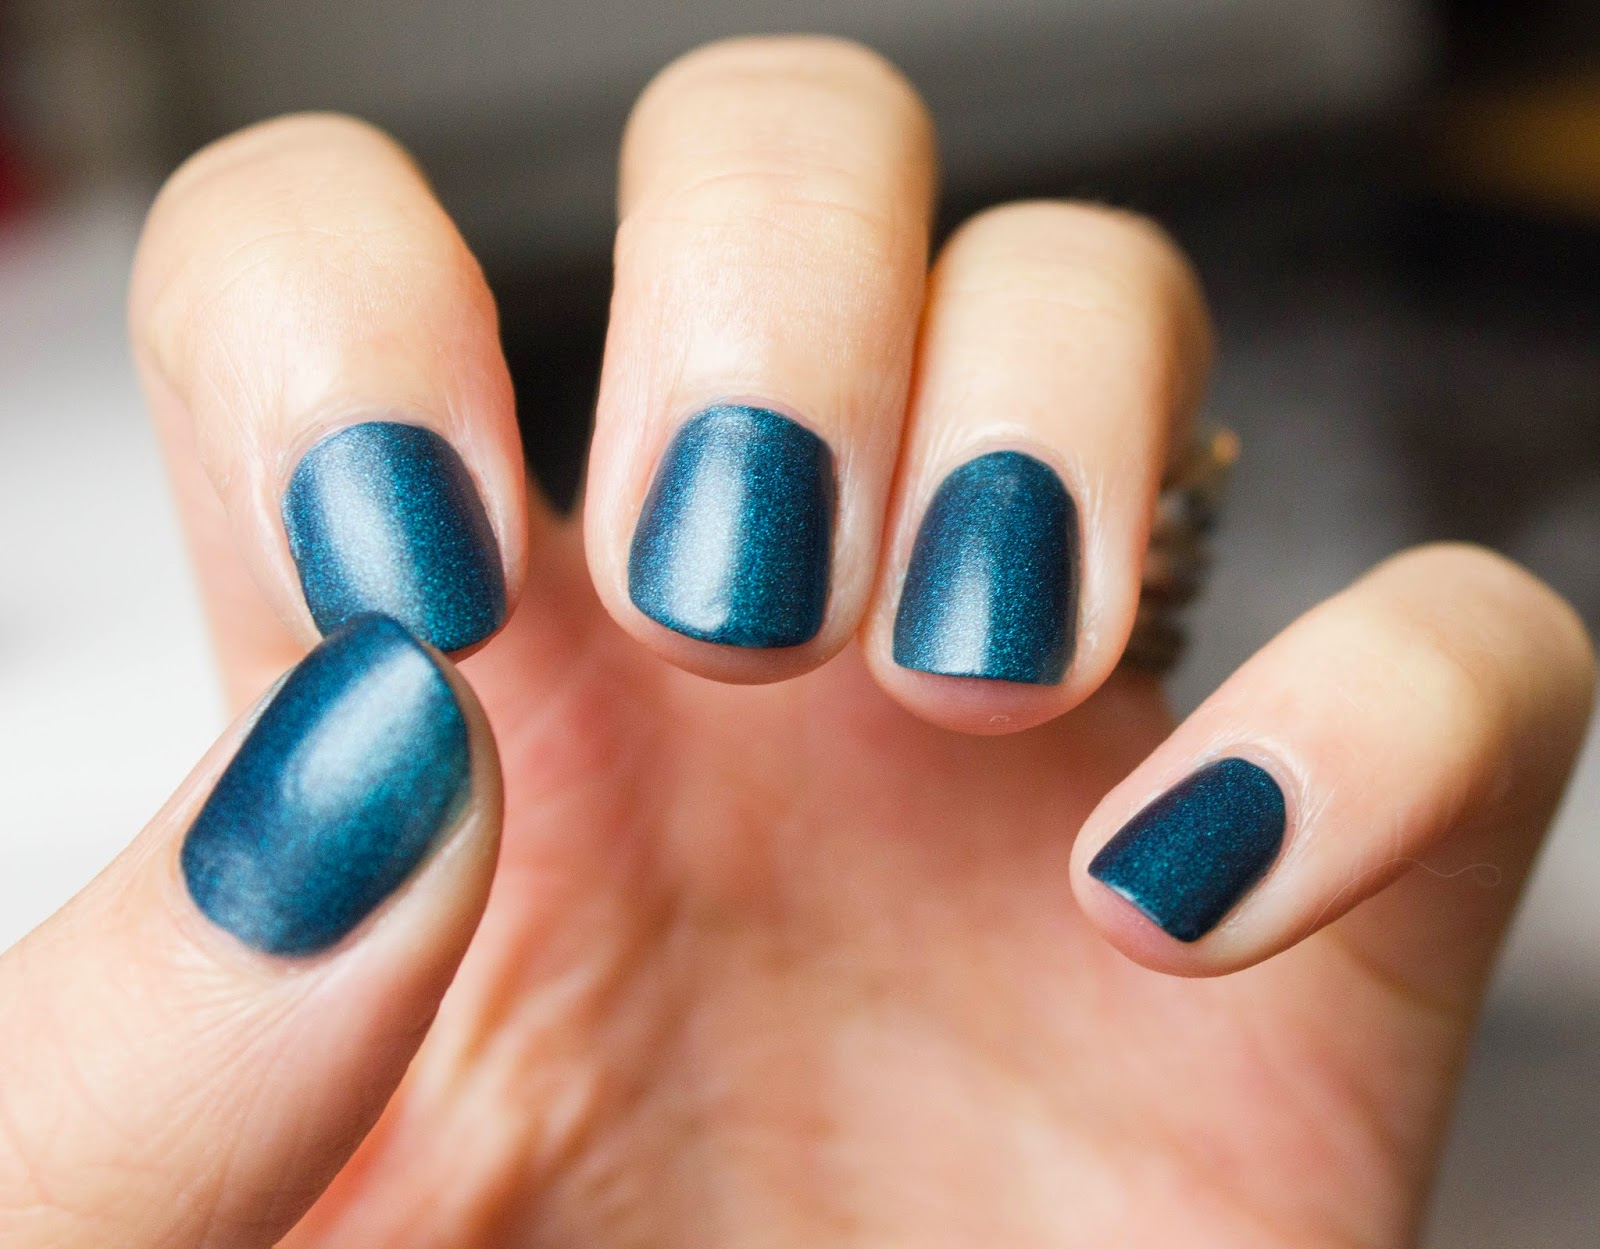 manucure mani bleu blue metalisé nail art